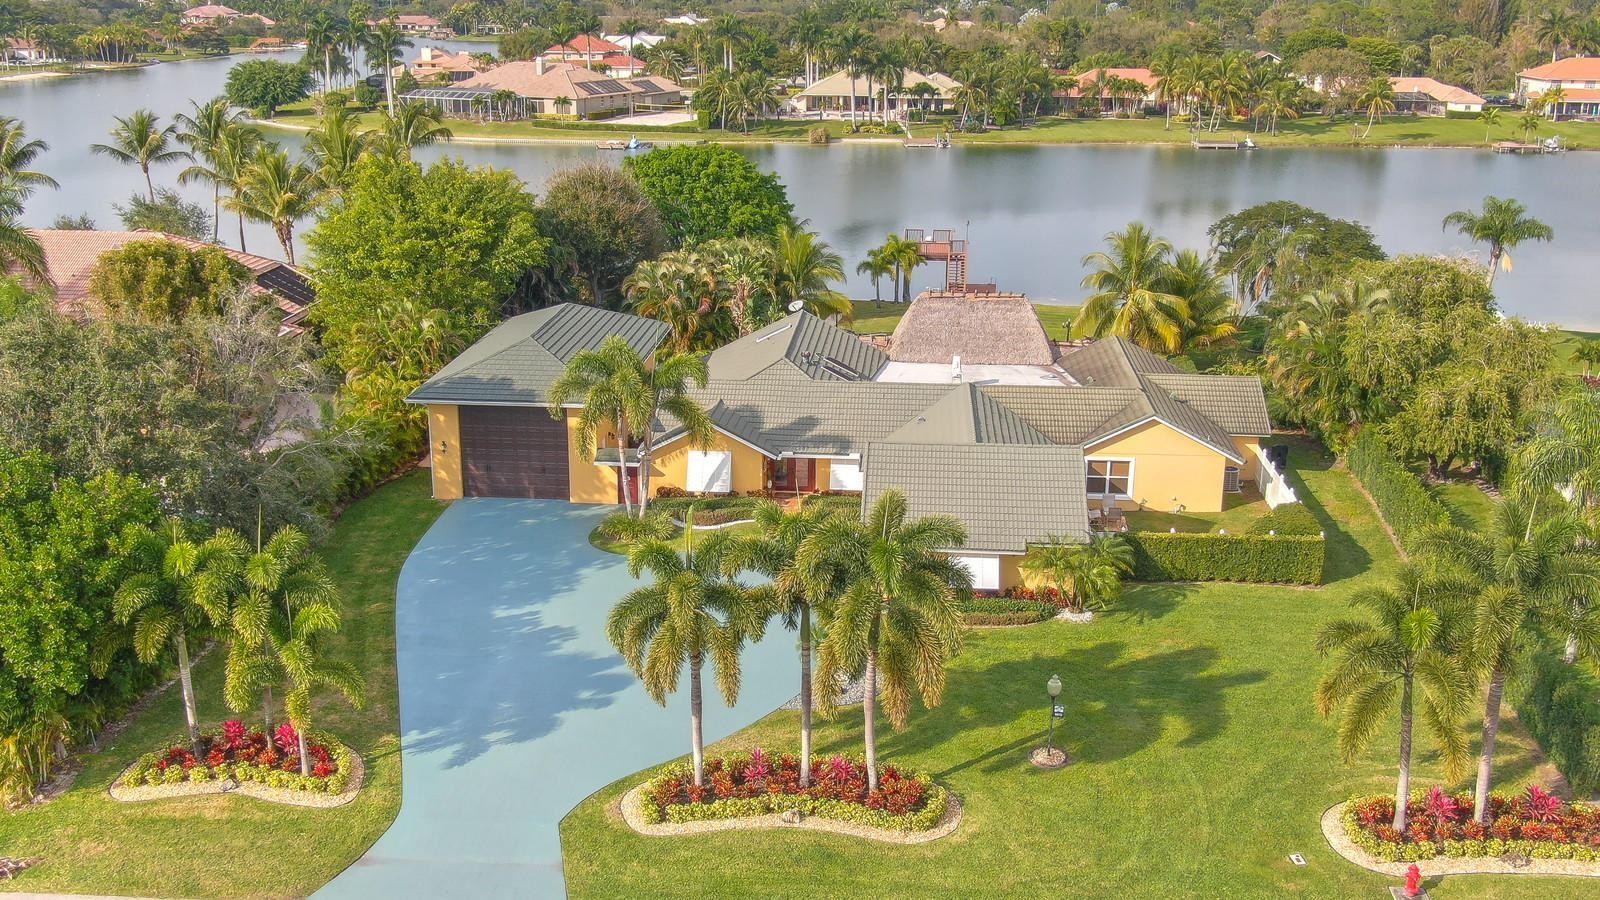 8813 Wendy Lane S, West Palm Beach, FL 33411 - #: RX-10648387